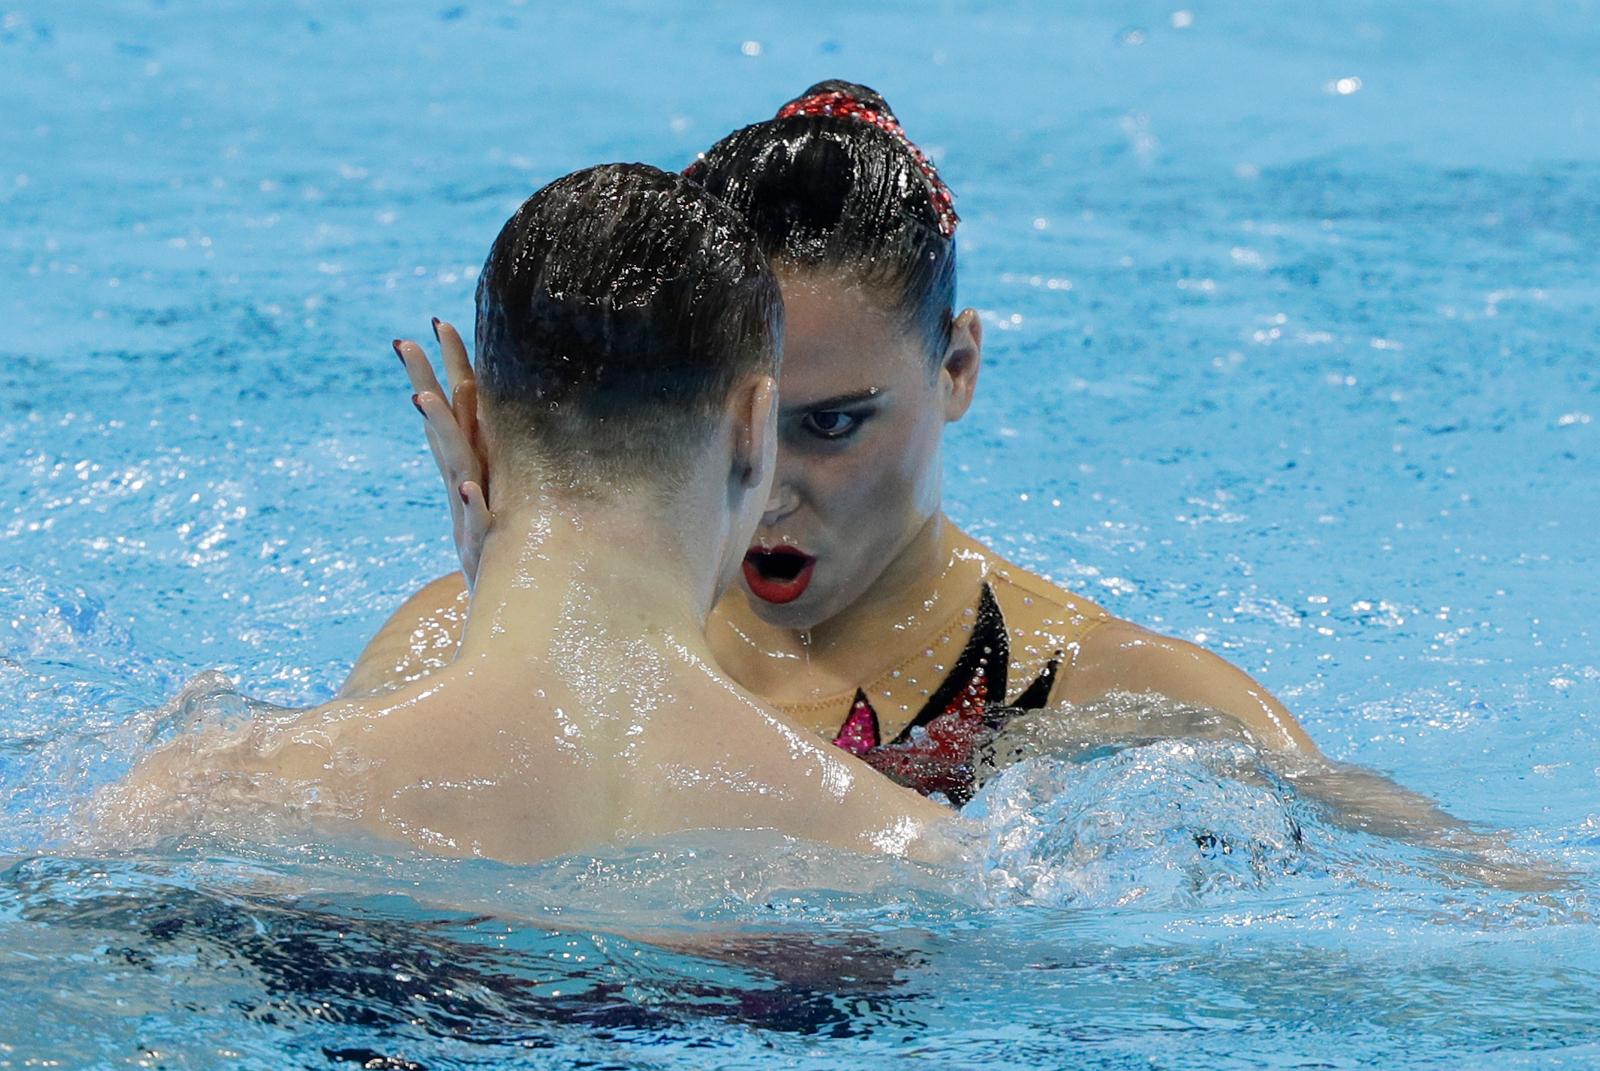 Russia's Mayya Gurbanberdieva and Aleksandr Maltsev perform during the artistic swimming mixed duet technical preliminaries at the World Swimming Championships in Gwangju, South Korea, Saturday, July 13, 2019. AP